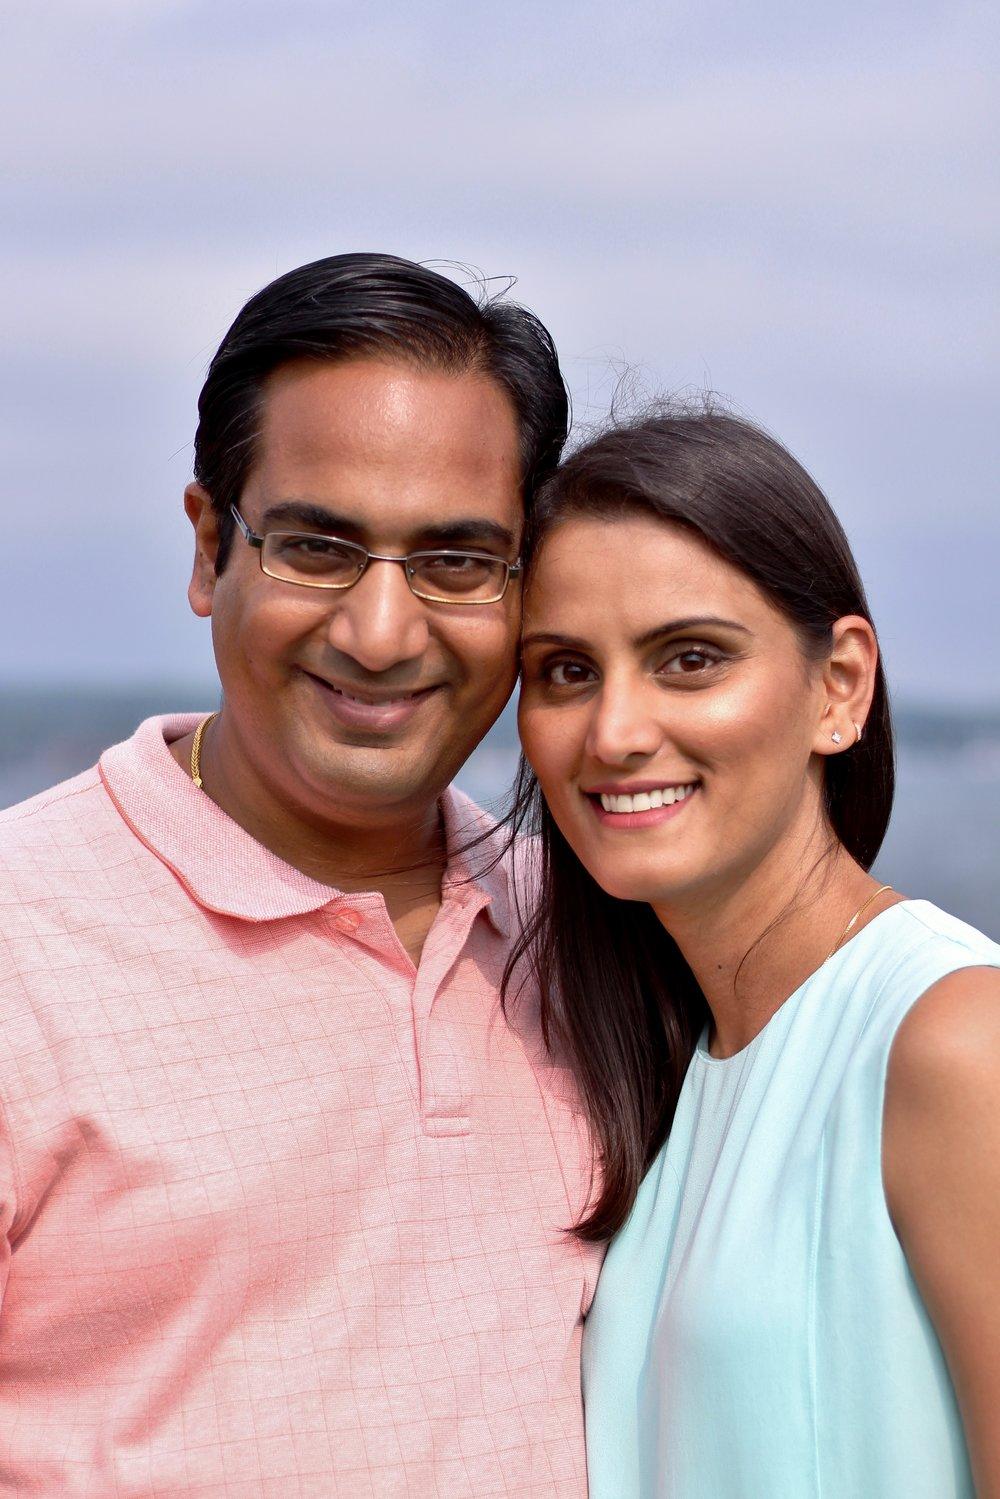 Patel Family Traverse City August 2018 (17).JPG